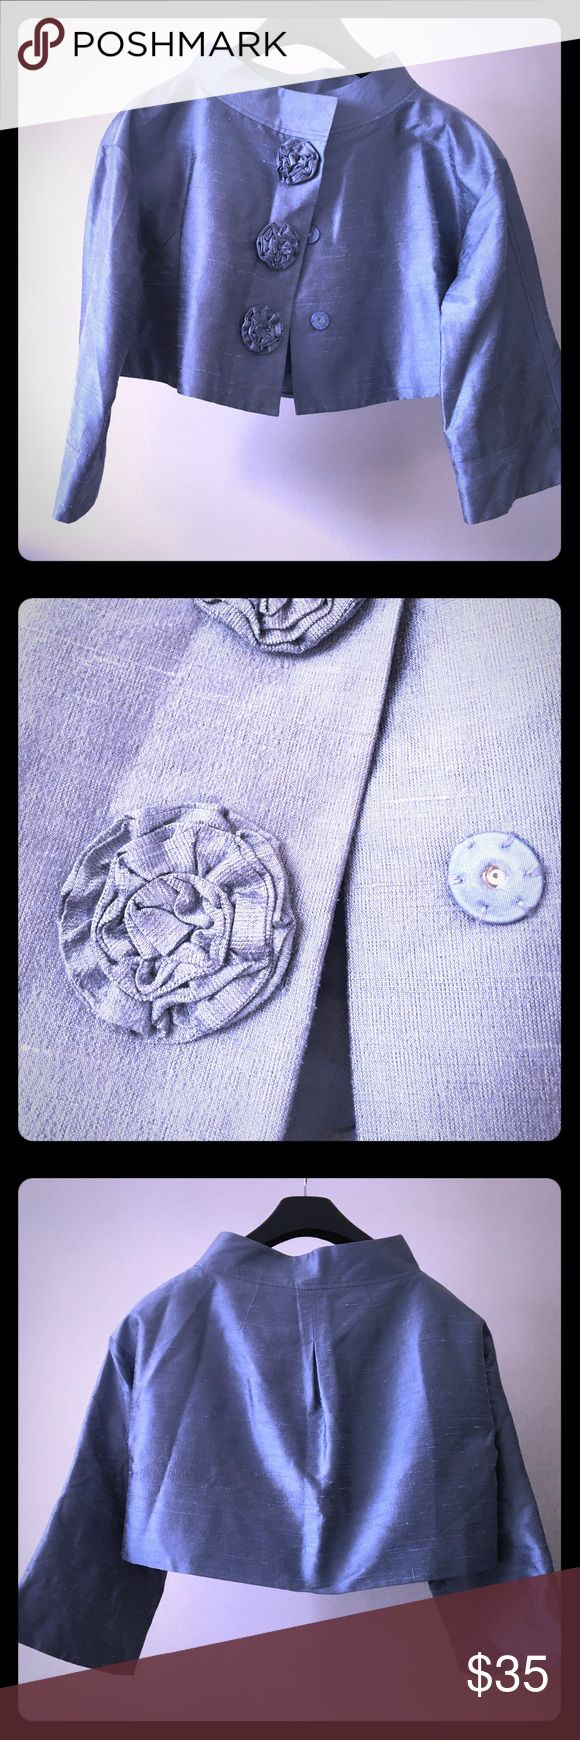 Ellen Tracy SIlk Jacket Silk Shantung crop with rosette buttons. Stunning jacket in pale blue. Never worn. Ellen Tracy Jackets & Coats